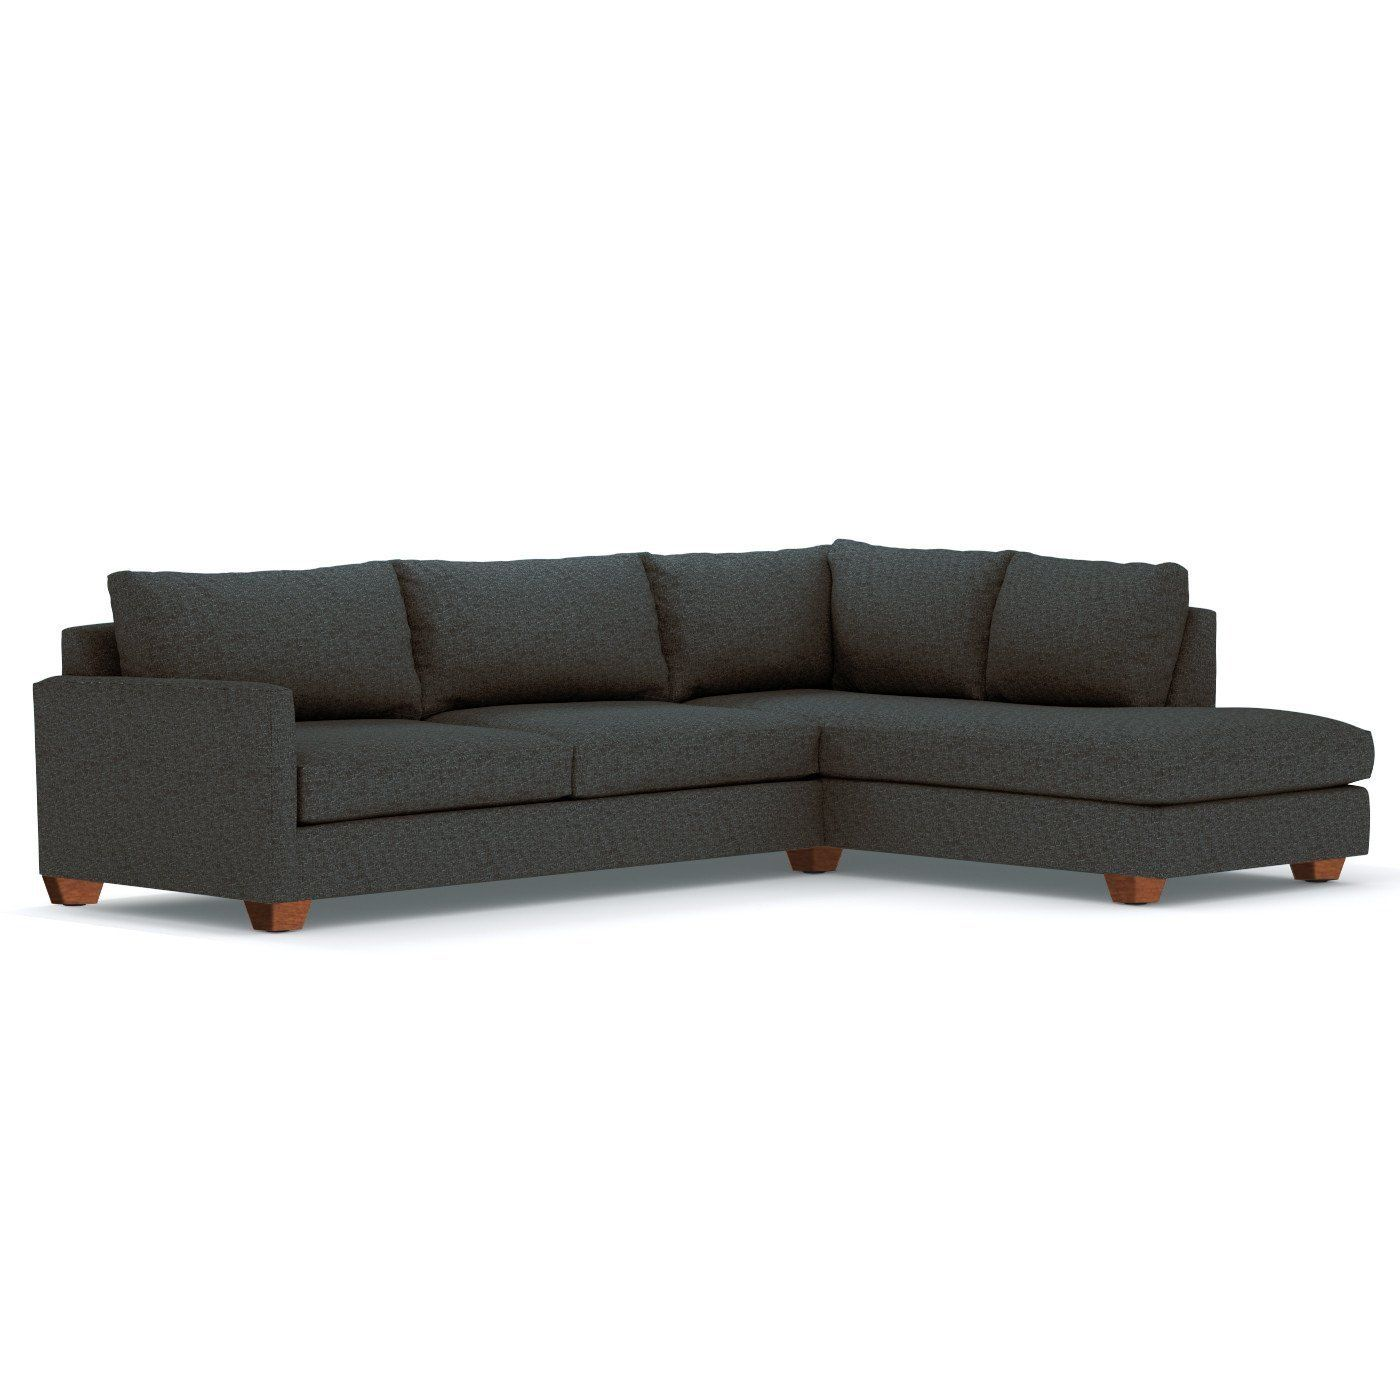 Apt 2b Tuxedo Two Piece Sectional Sofa Sectional Sleeper Sofa Sectional Sofa Modern Sleeper Sofa